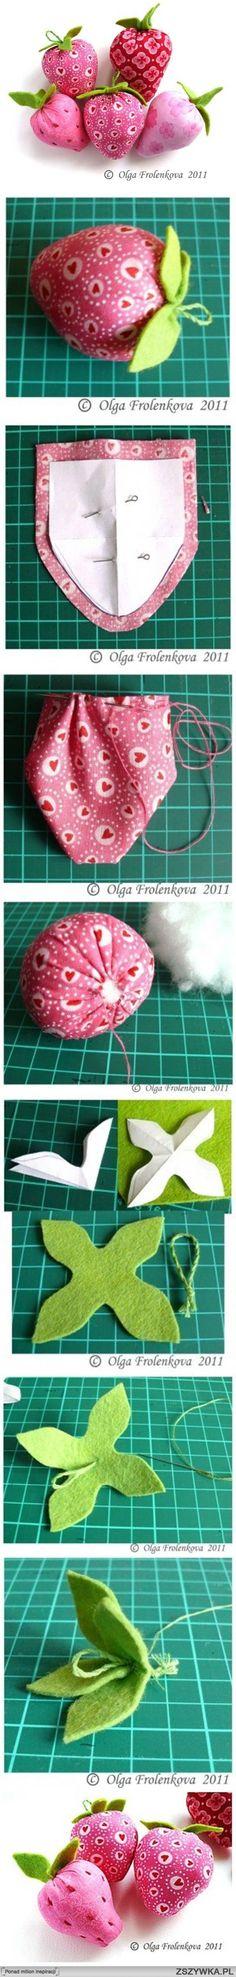 diy, sew, fabric, strawberry